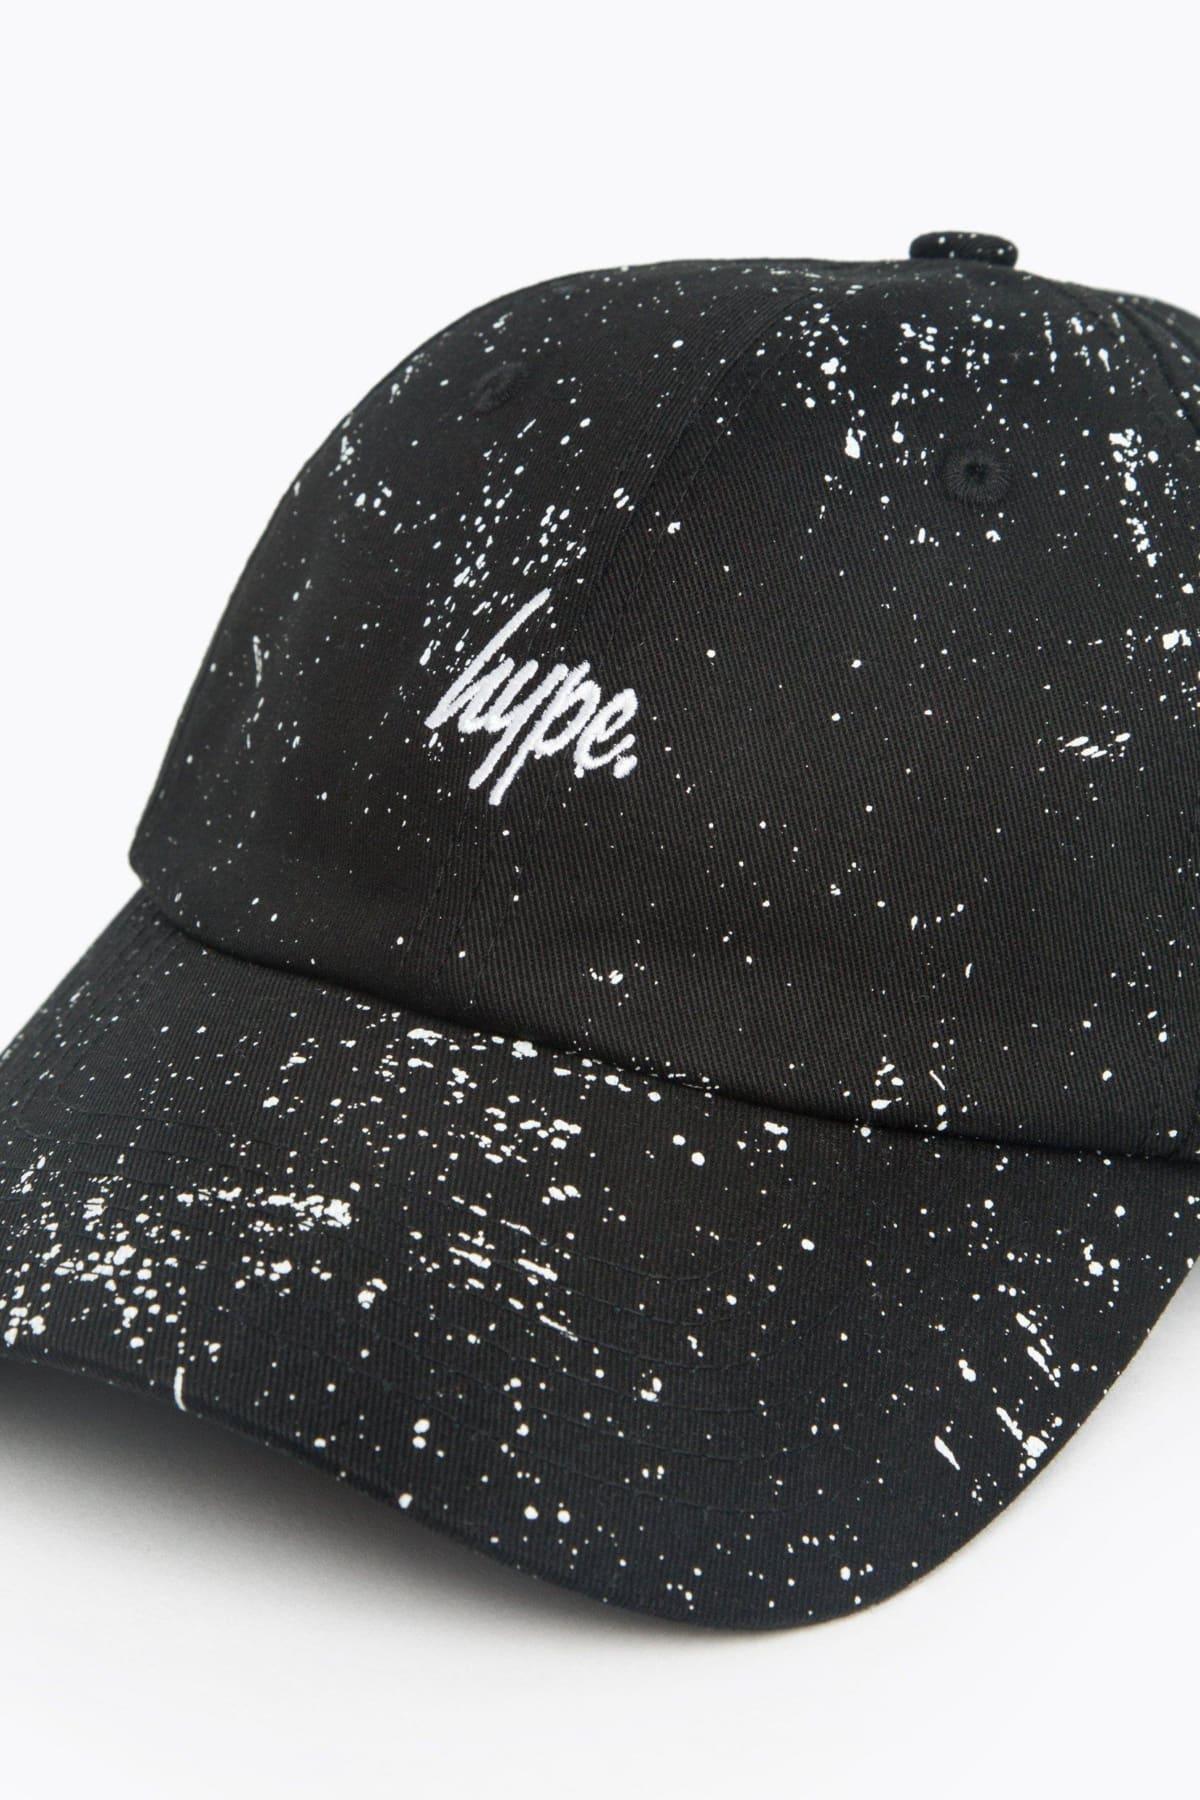 HYPE Black/White Script Speckle Dad Hat